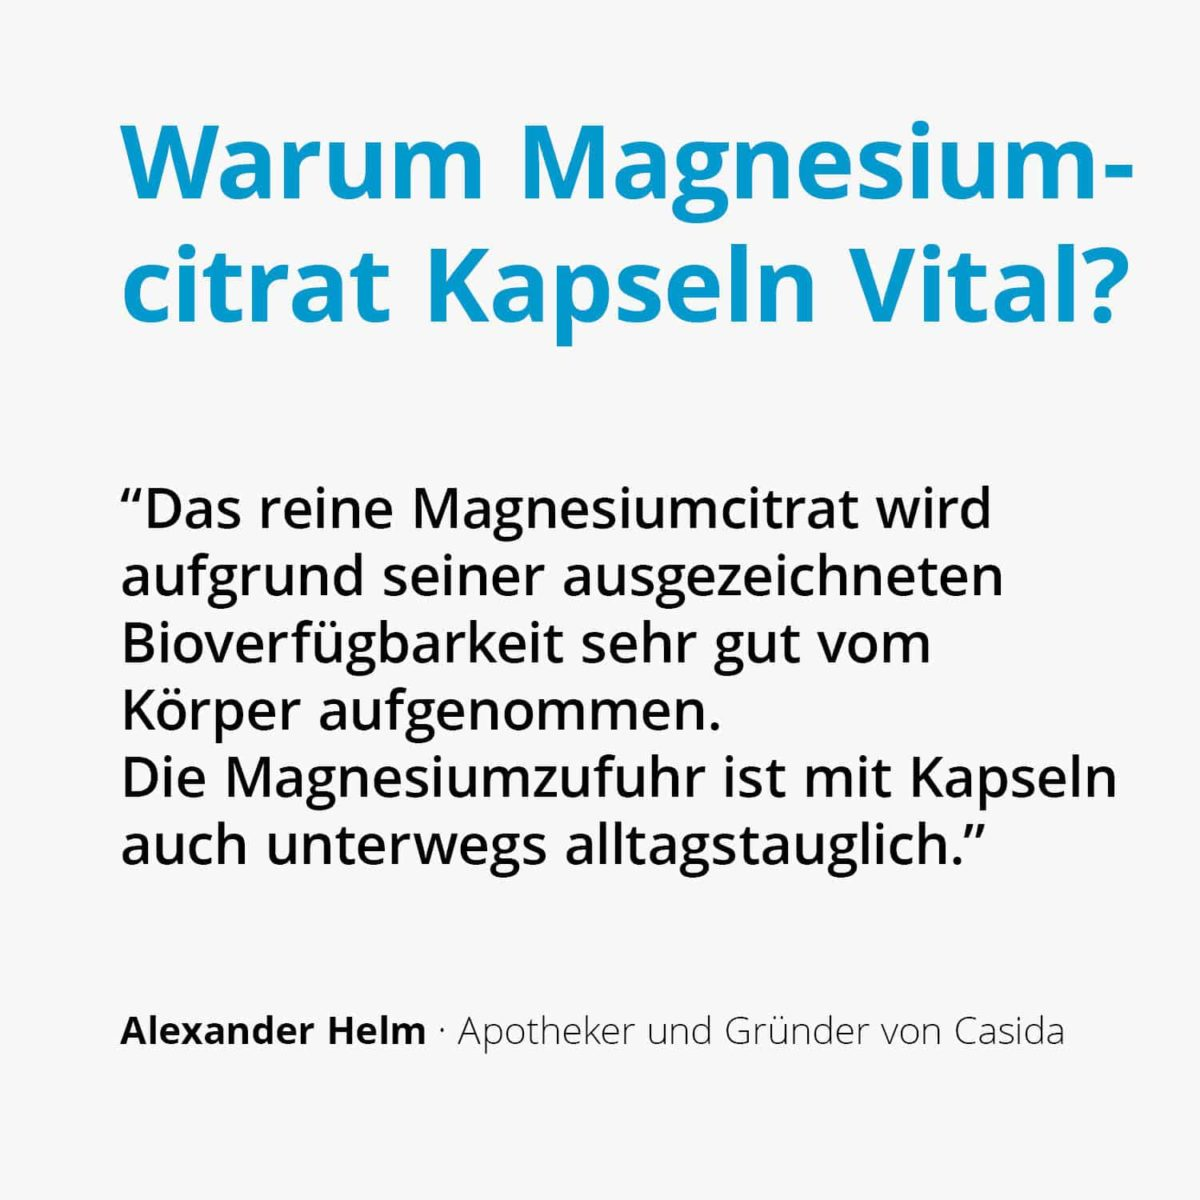 Casida Magnesiumcitrat Kapseln Vital – 120 Stk. 14362474 PZN Apotheke Muskelkater Muskelkrampf Sport2